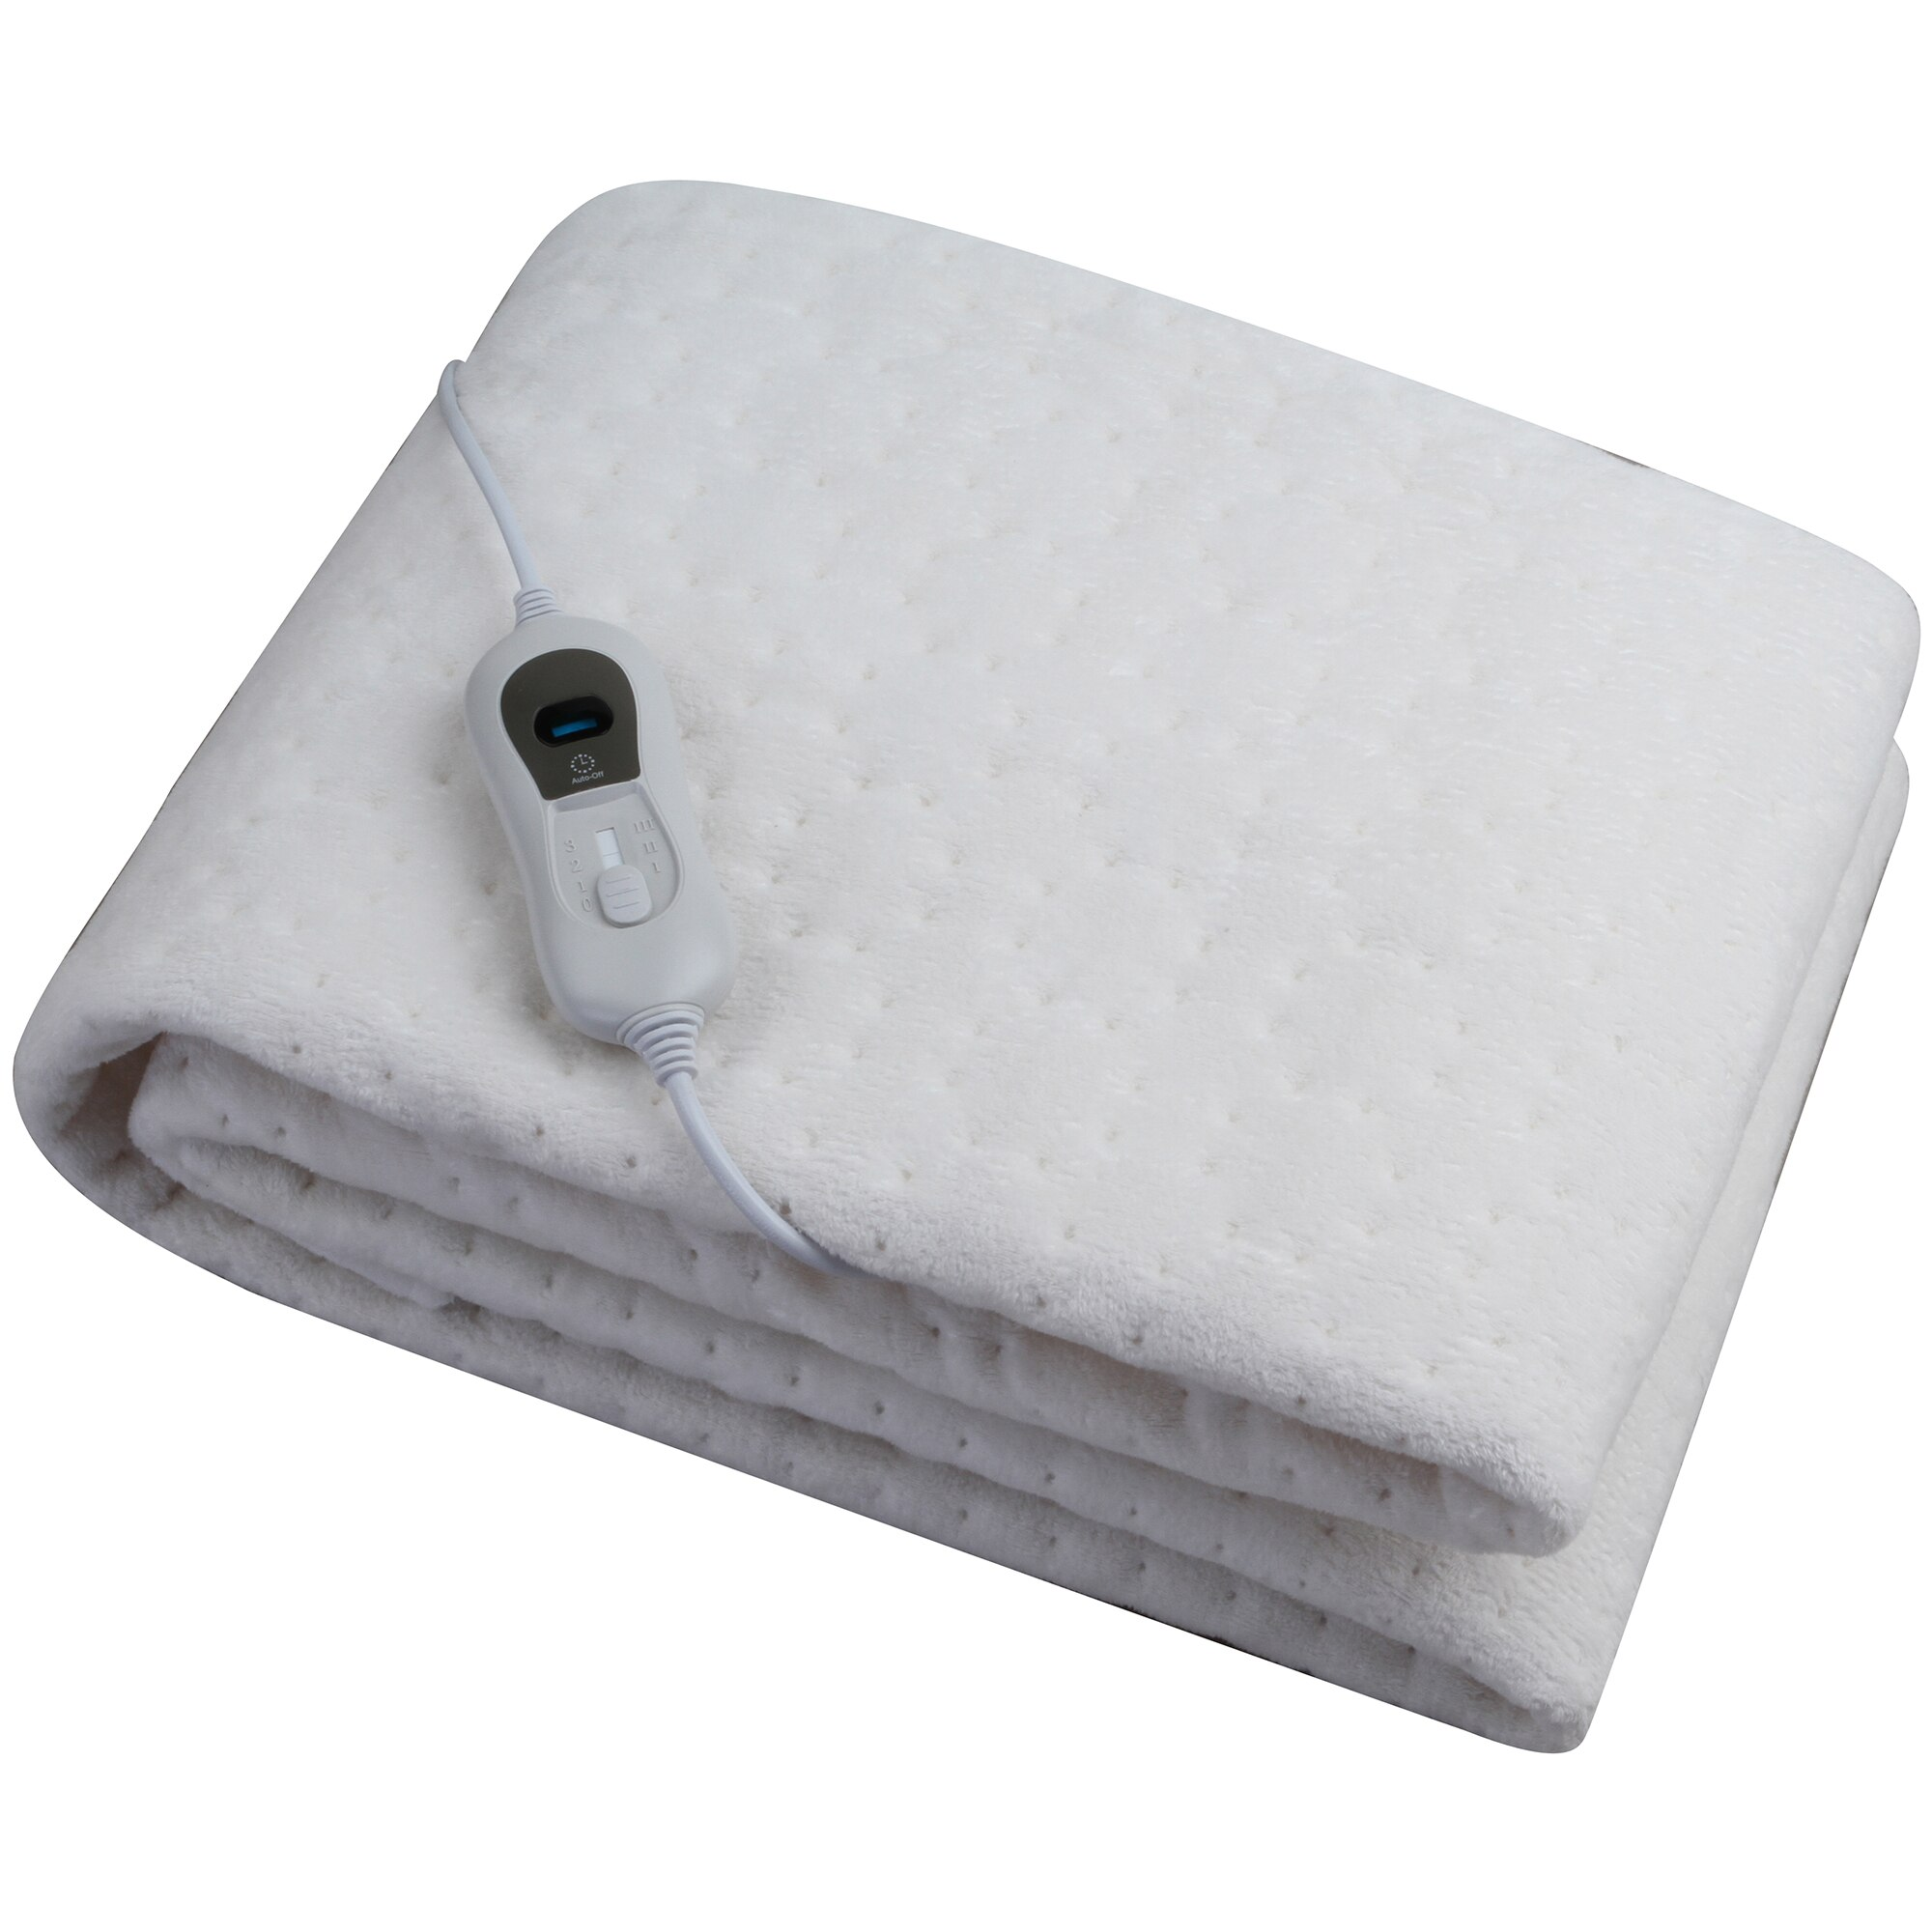 Fotografie Saltea cu incalzire electrica Kring, 200 x 90 cm, fleece, 3 trepte de incalzire, 60 W, Alb